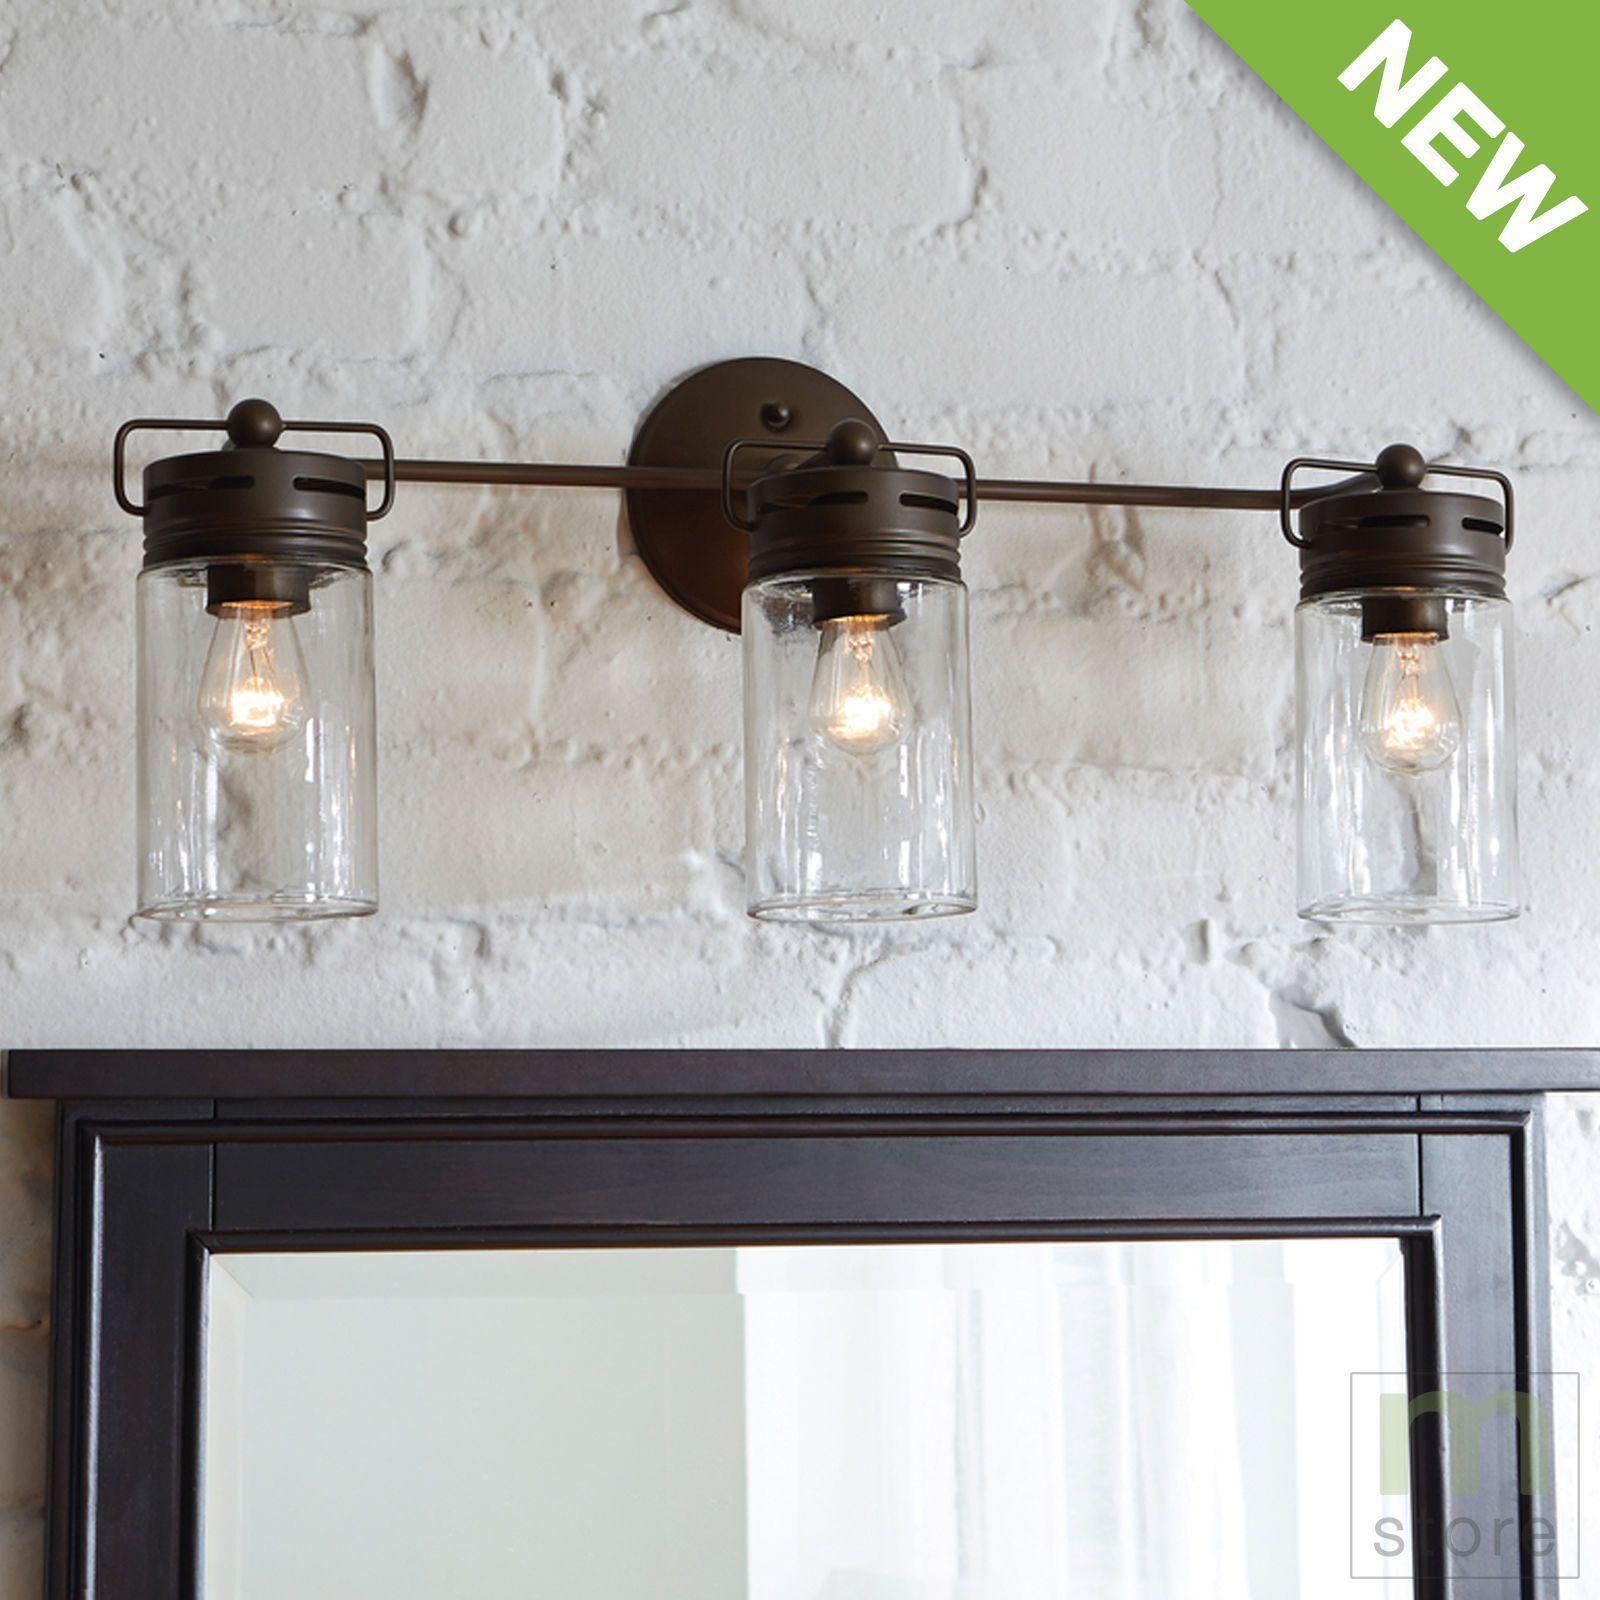 Photo of Bathroom Vanity 3 Light Fixture Aged Bronze Mason Jar Wall Lighting Allen + Roth …